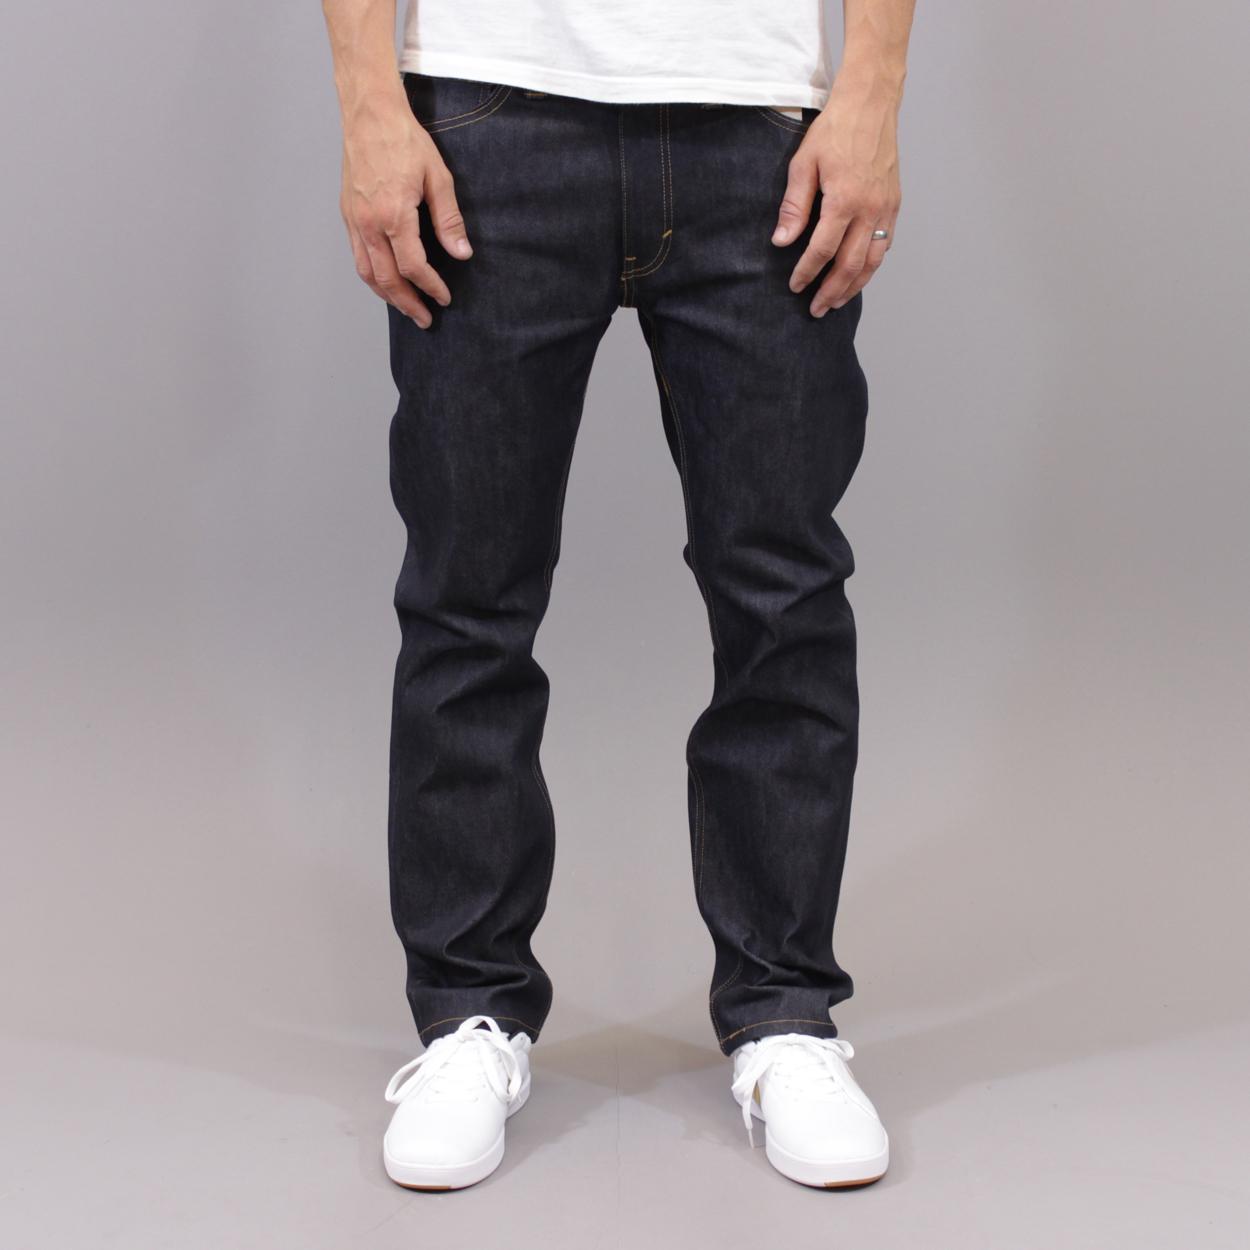 Levis Skateboarding 513 Slim Fit Straight S&E Jeans  Rigid Indigo